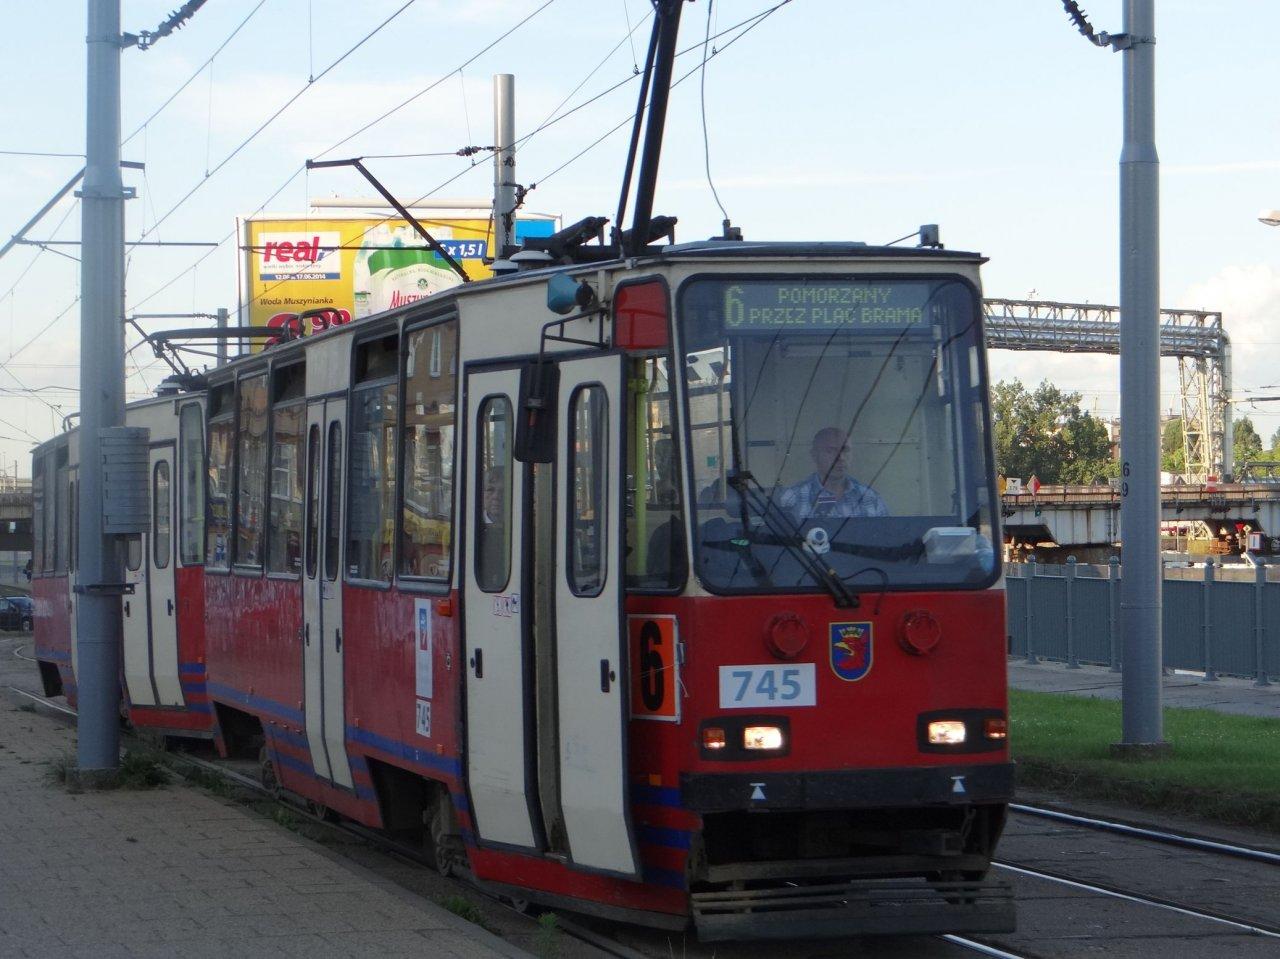 DSC020851.jpg